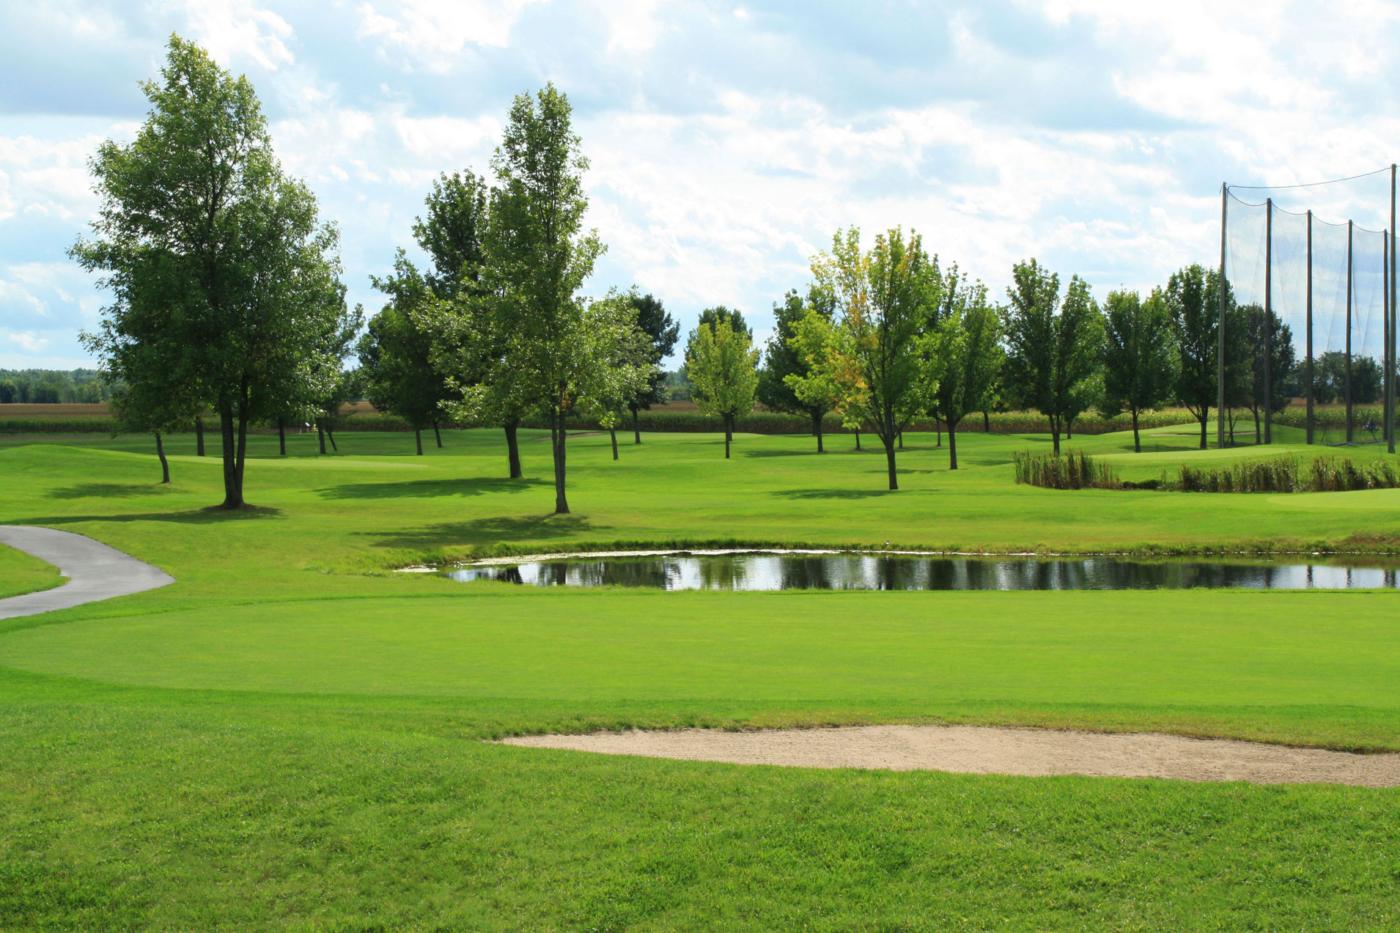 terrain de golf rive sud laprairie club de golf l 39 express. Black Bedroom Furniture Sets. Home Design Ideas